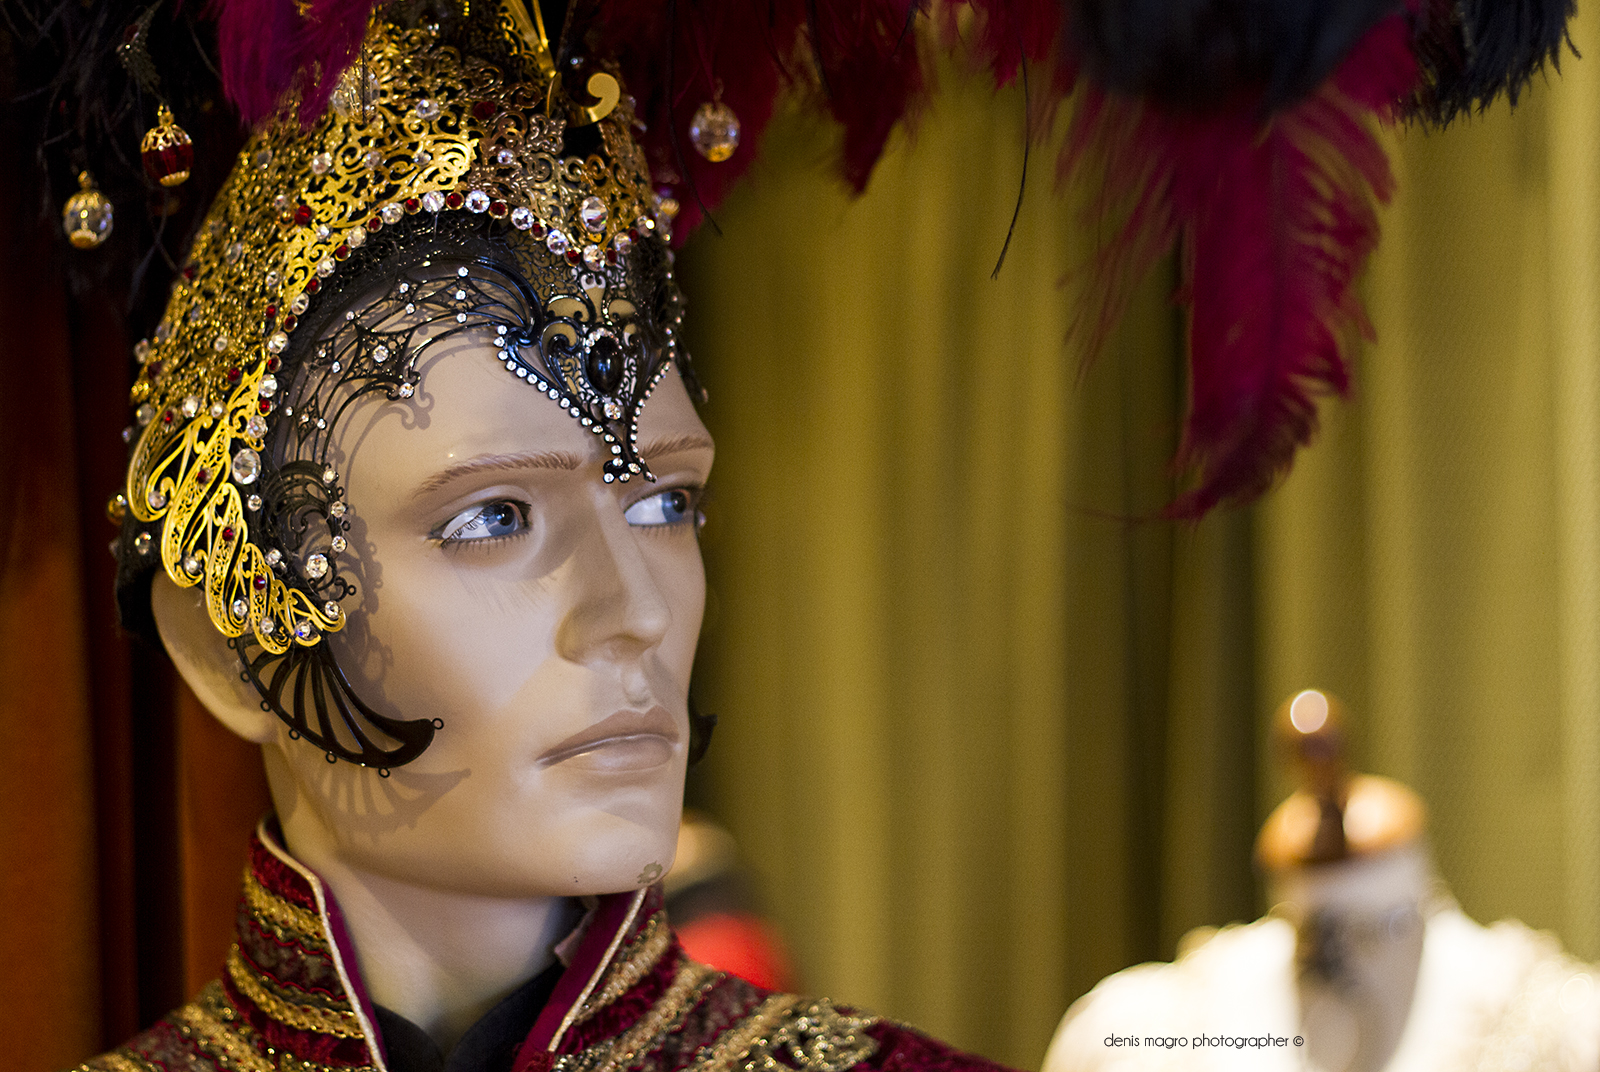 Carnevale Venezia / Denis Magro / maschere